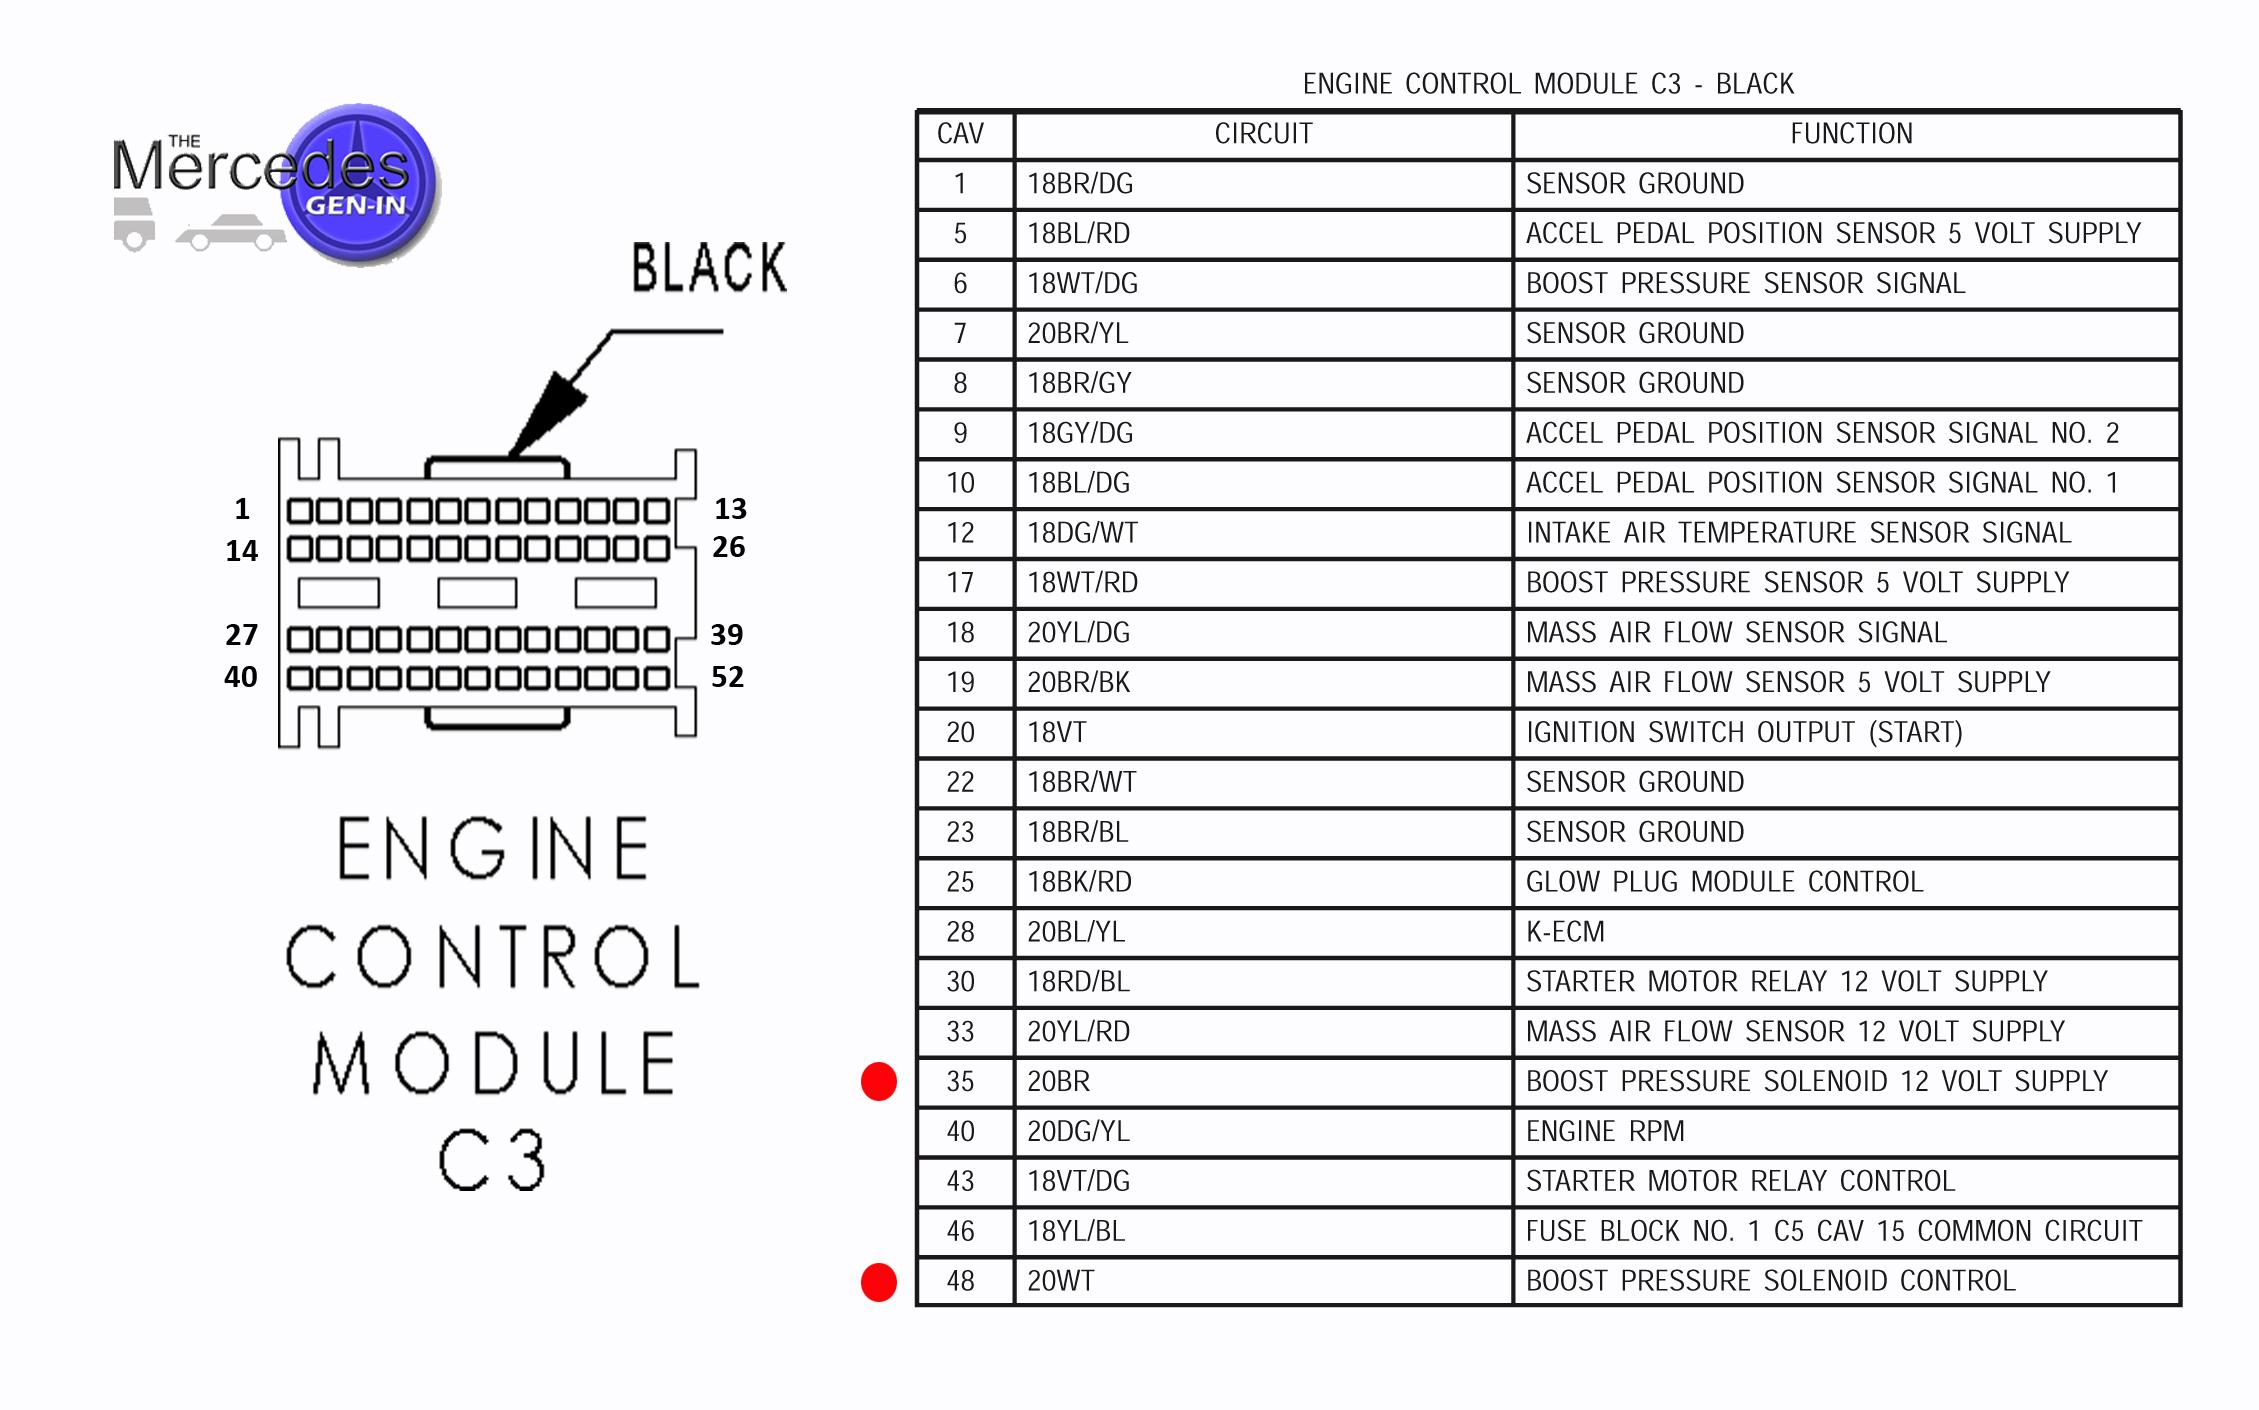 [SCHEMATICS_4JK]  E08 Mercedes Sprinter Fuse Box Diagram | Wiring Resources | 2013 Mercedes Sprinter Fuse Box |  | Wiring Resources